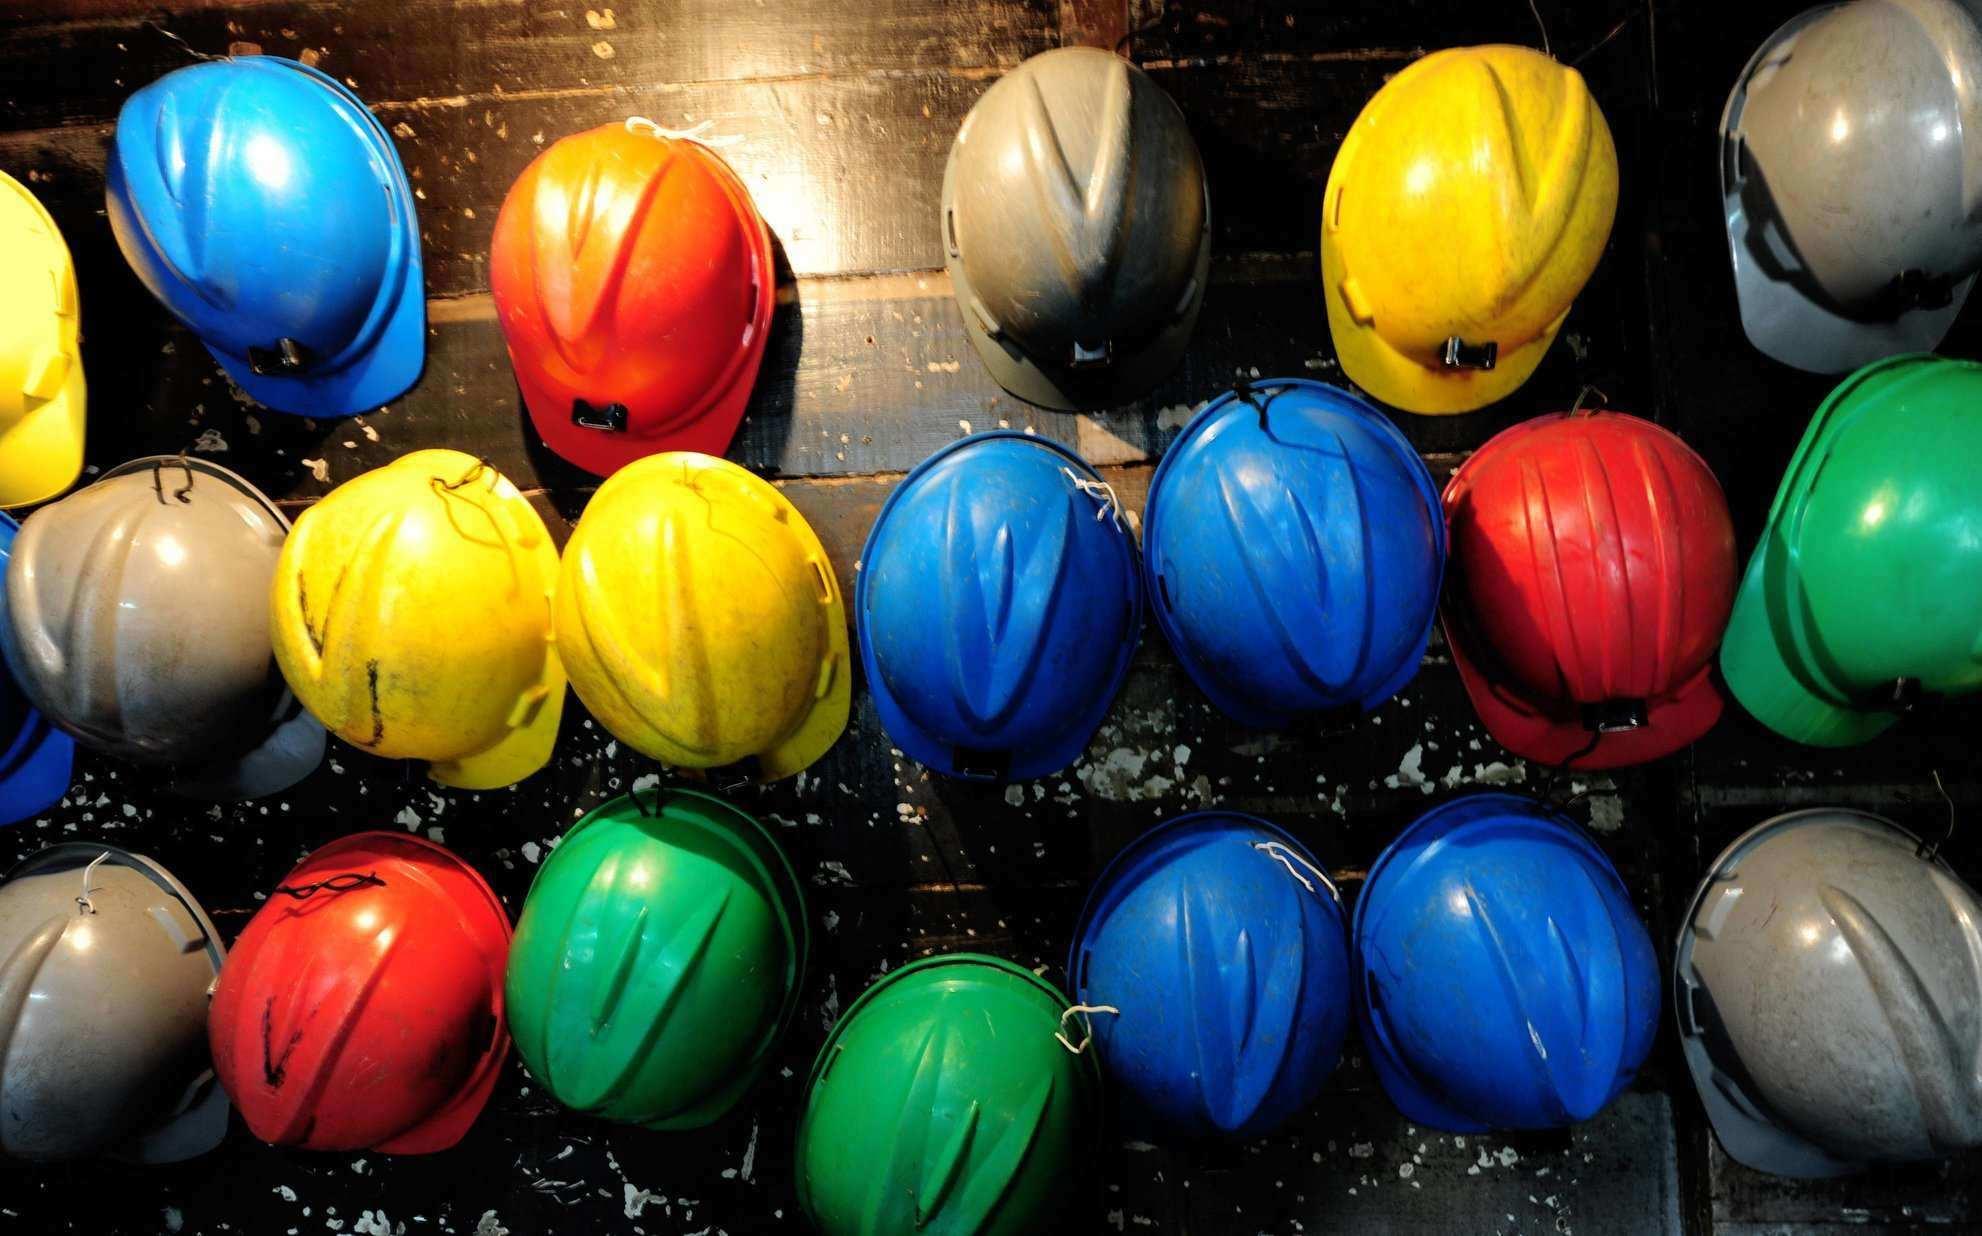 Guatemala sets date for Fénix nickel mine consultation